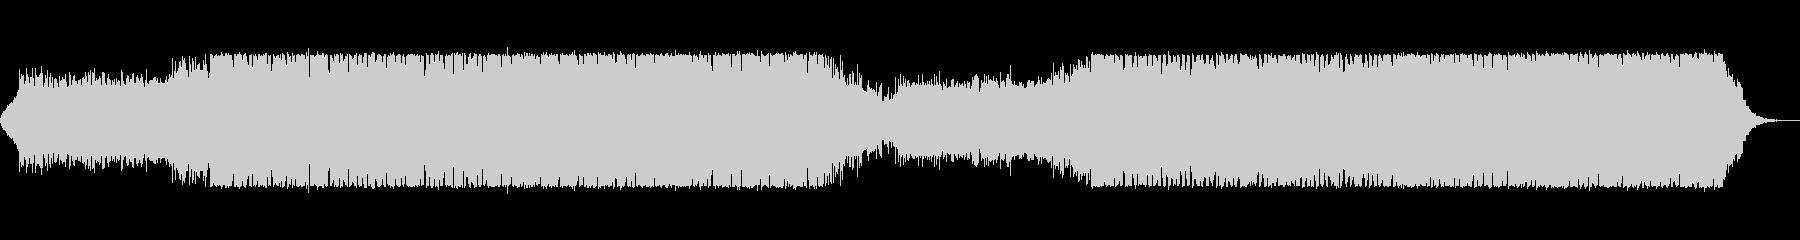 bpm128の元気の出るEDMの未再生の波形